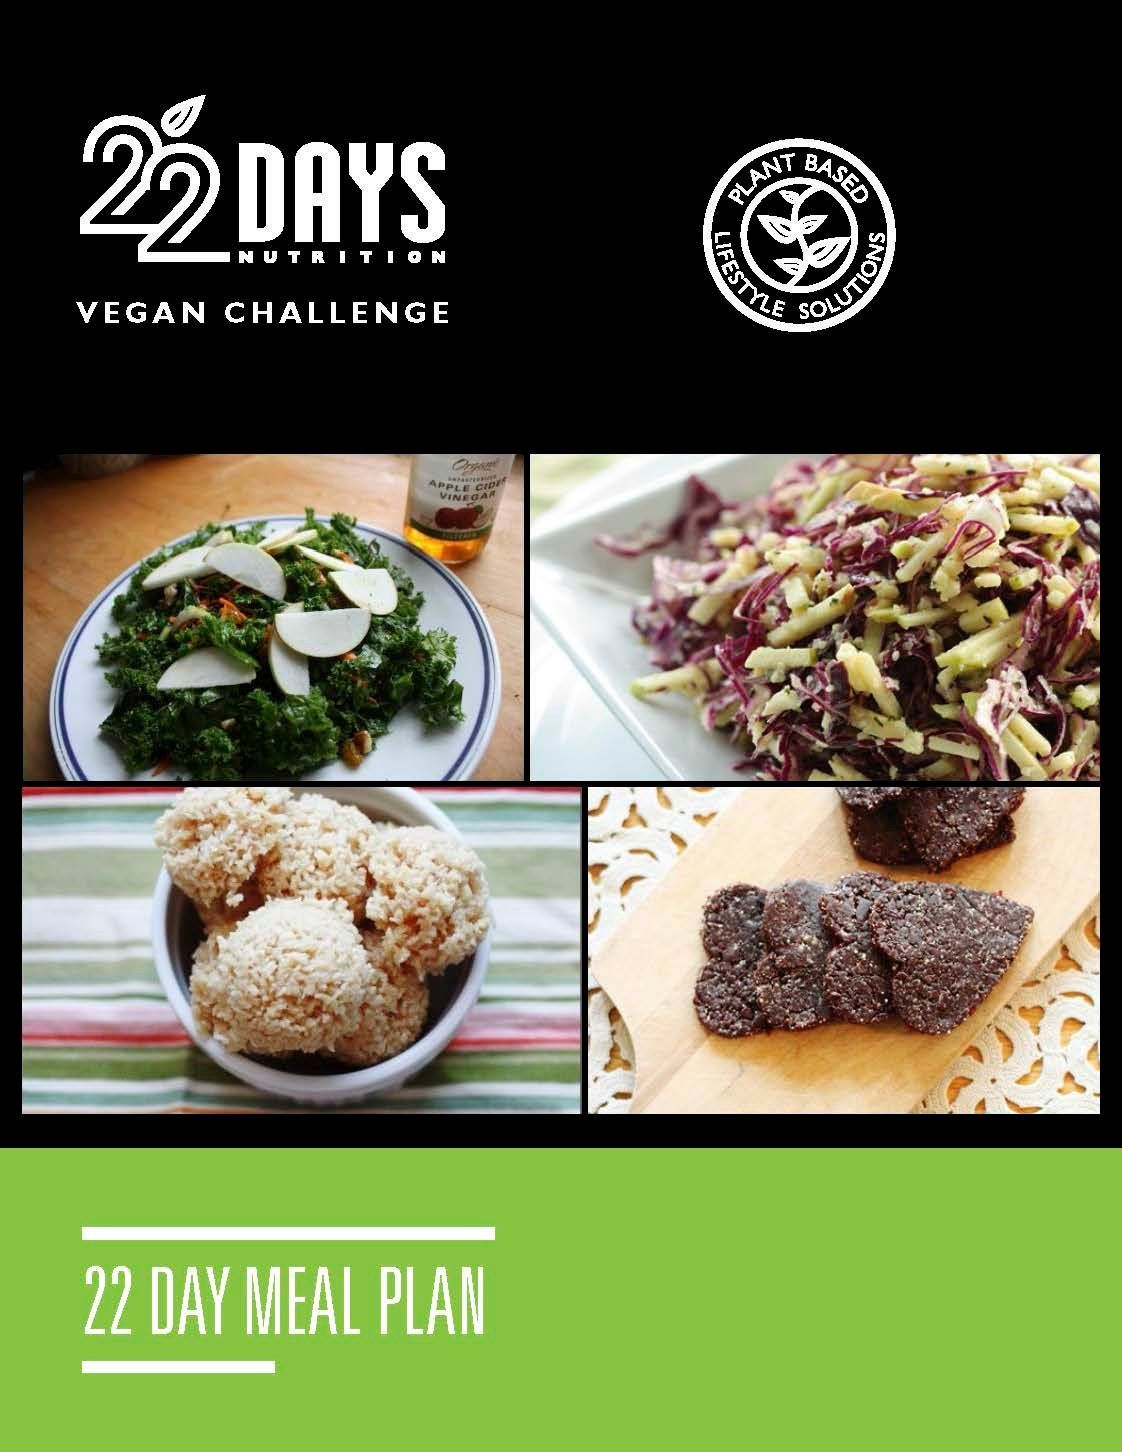 Pin On Vegan Download 2019 Pdf Ebook 1 Link Veganfitness Veganfood Vegan Ebook Offer Photography Love Video Music